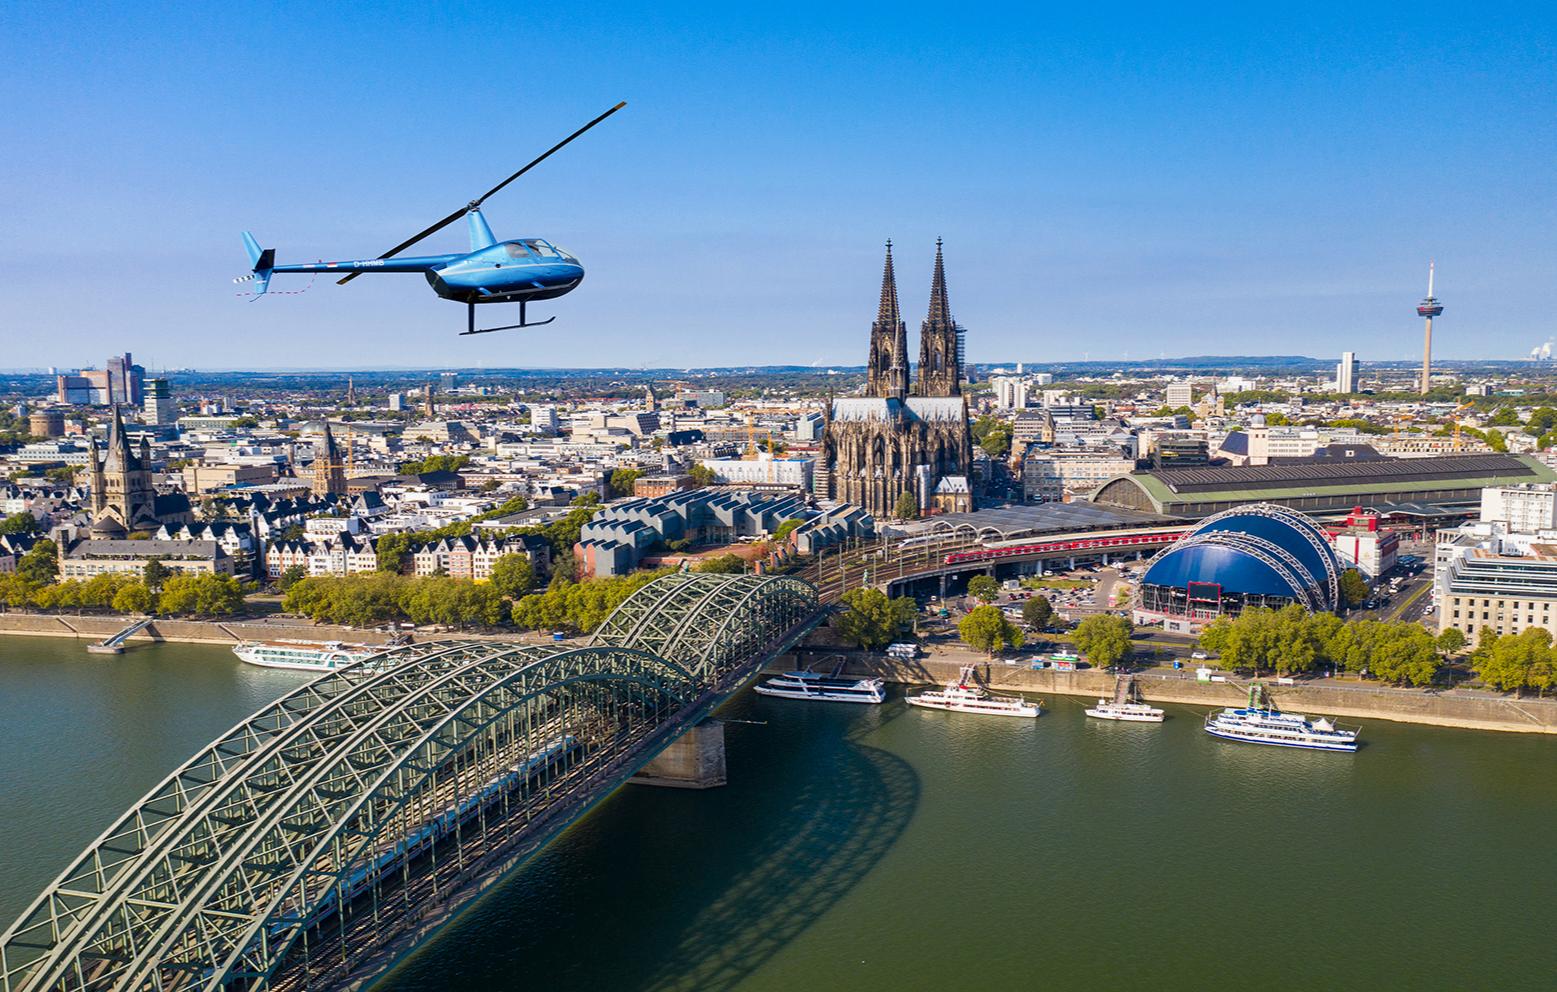 hubschrauber-skyline-flug-sankt-augustin-koeln-bg11622625430